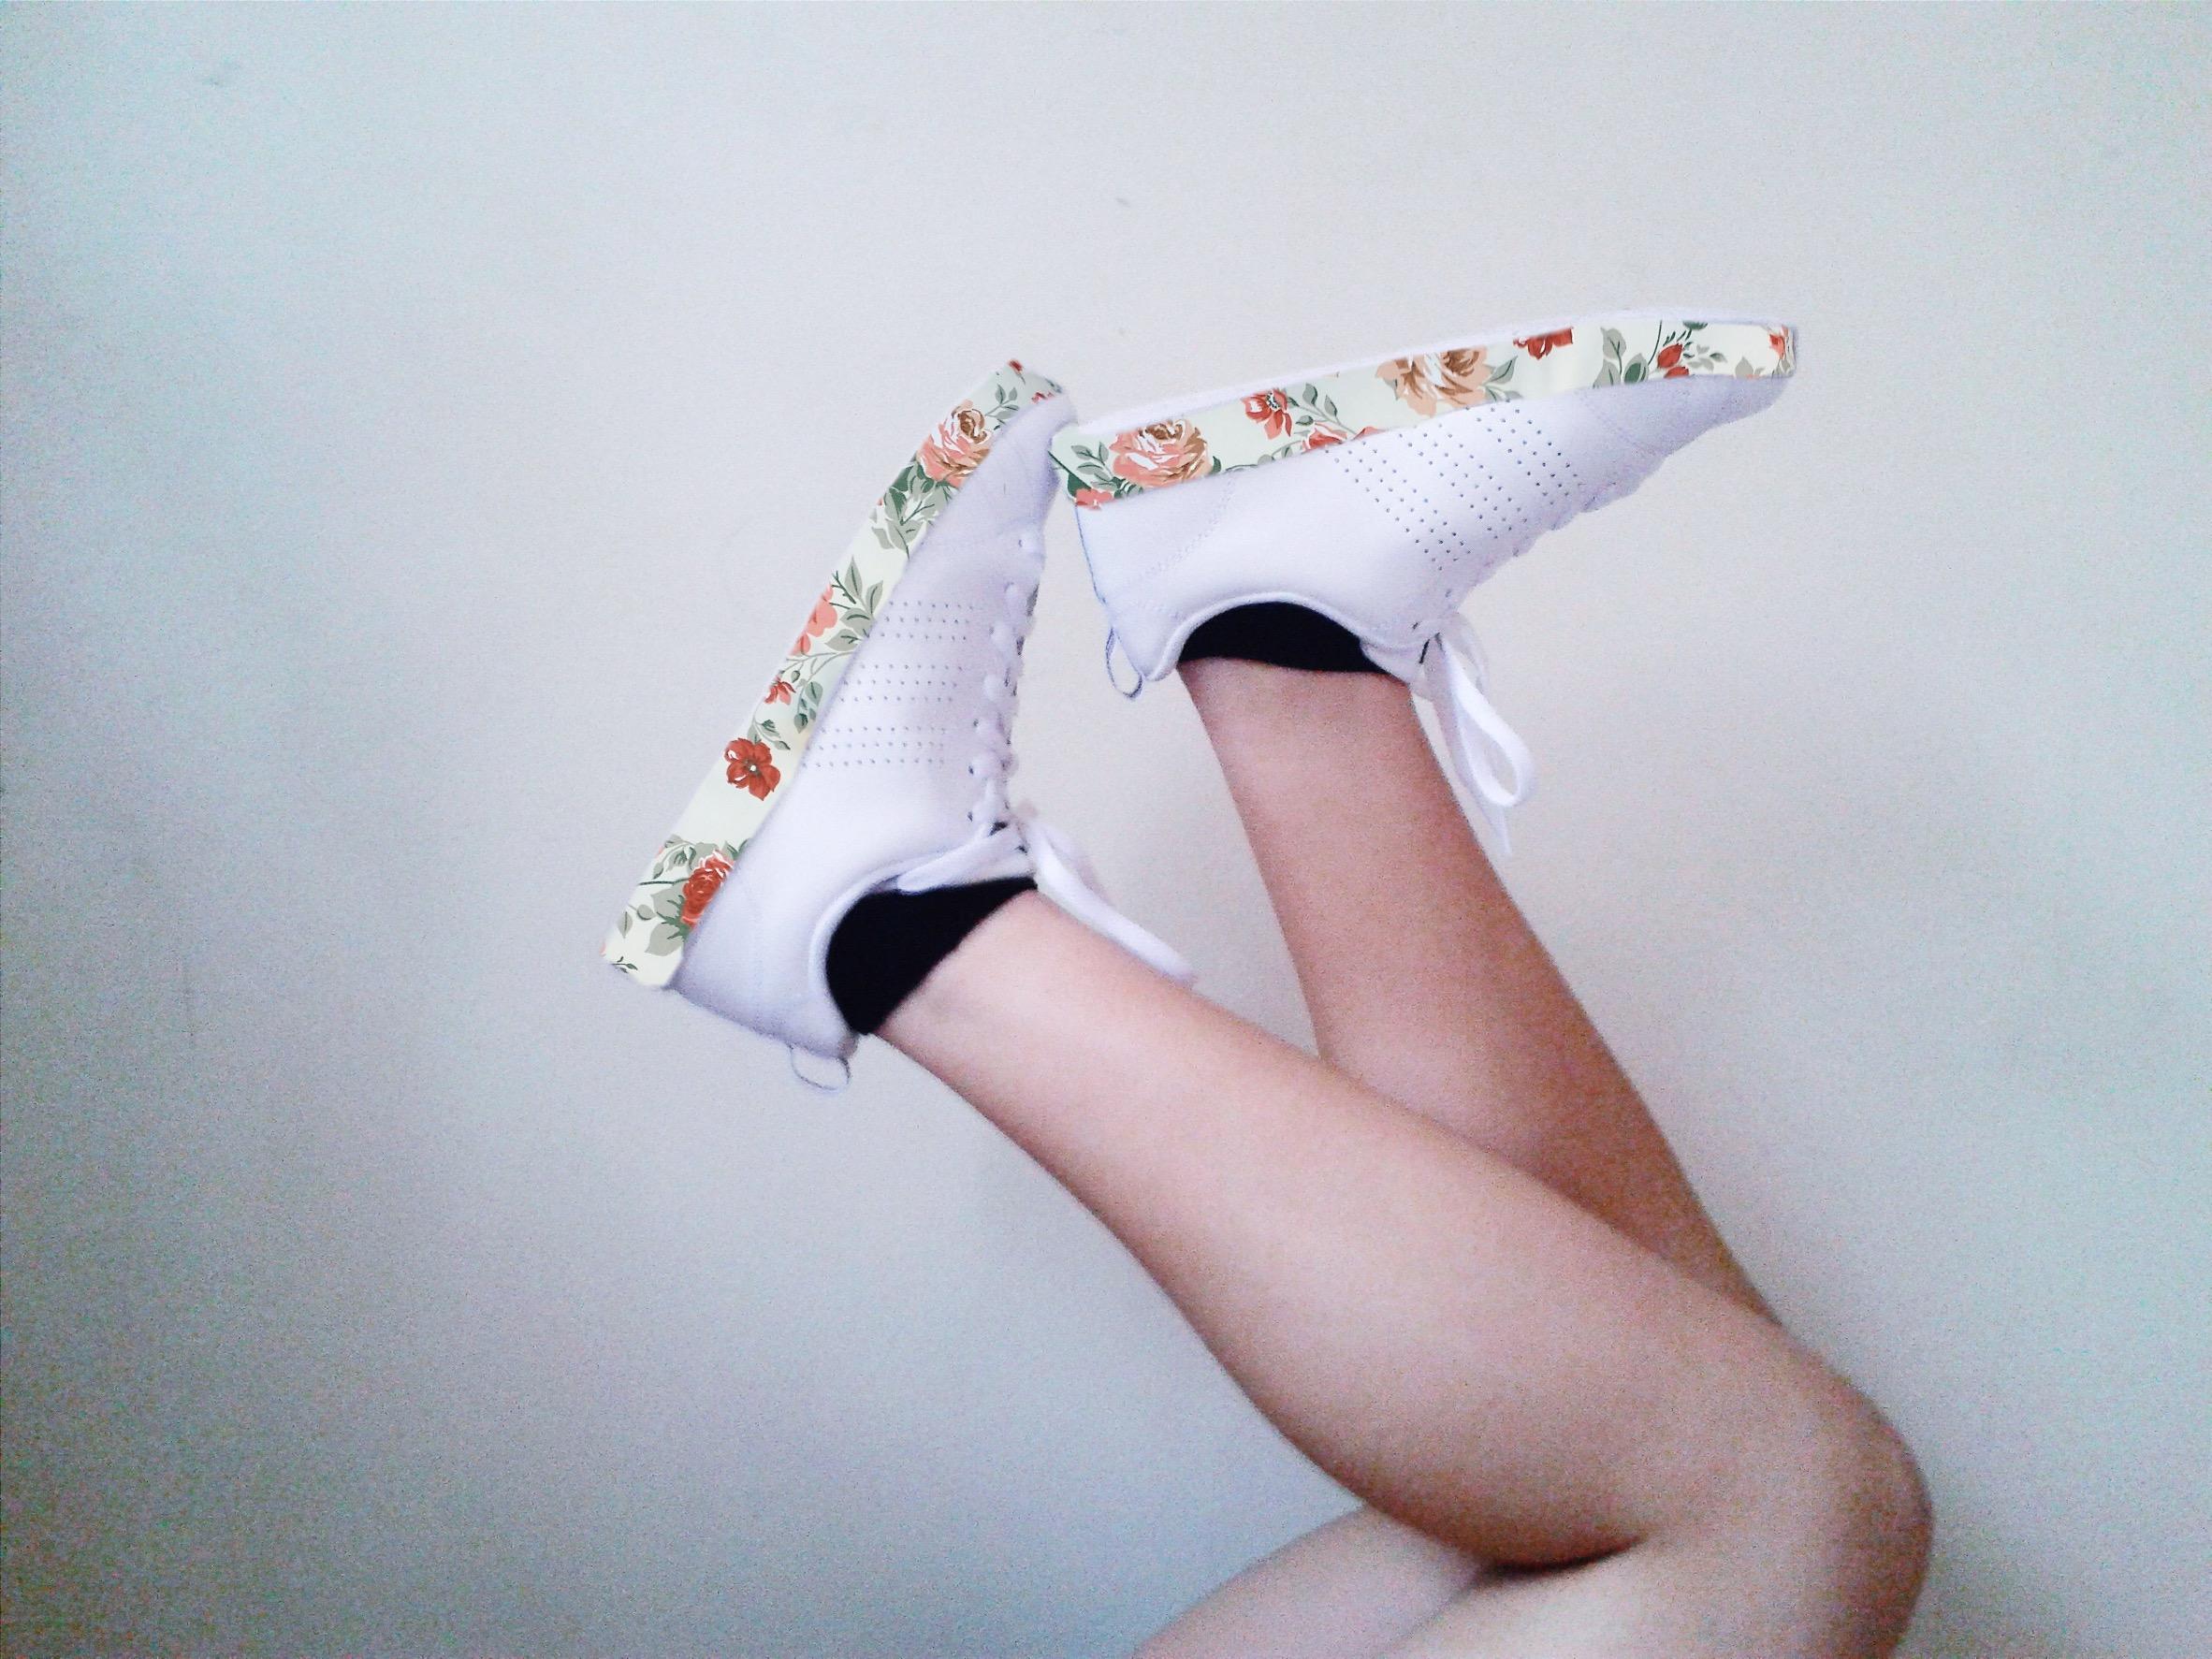 #FreeToEdit #interesting #art #shoes #adidas #white #flowers #wapfloralwrap